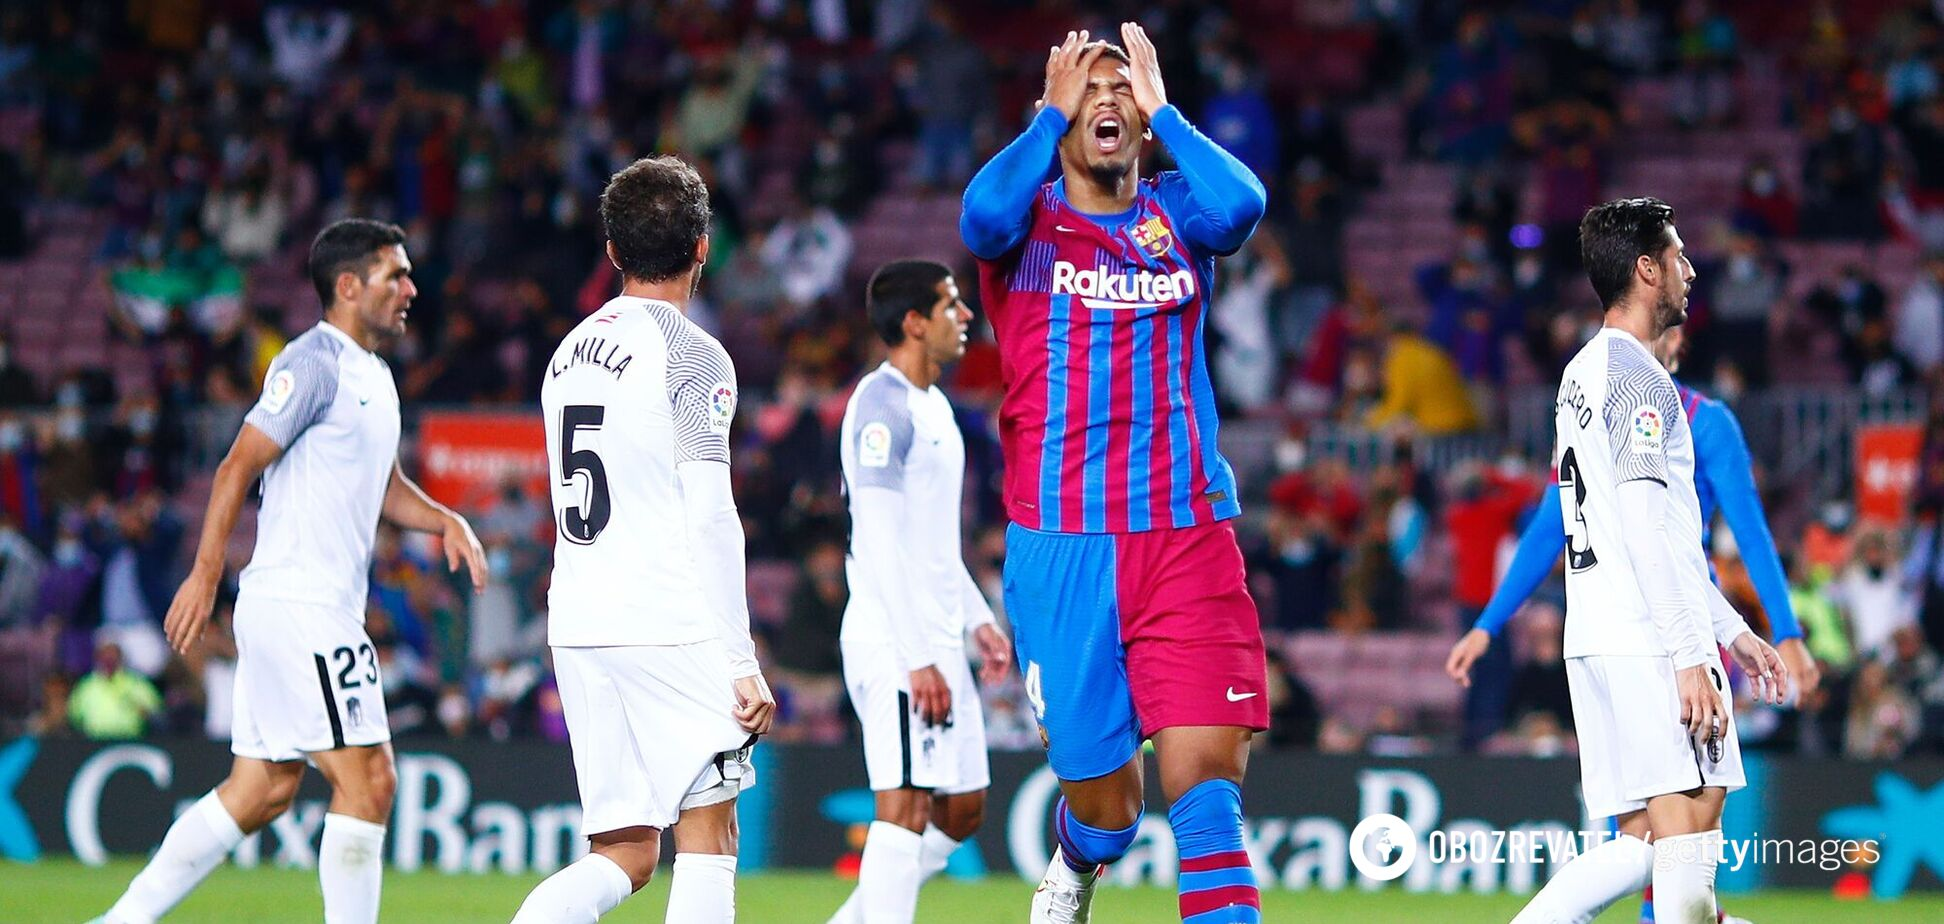 Барселона Гранада результат и обзор матча